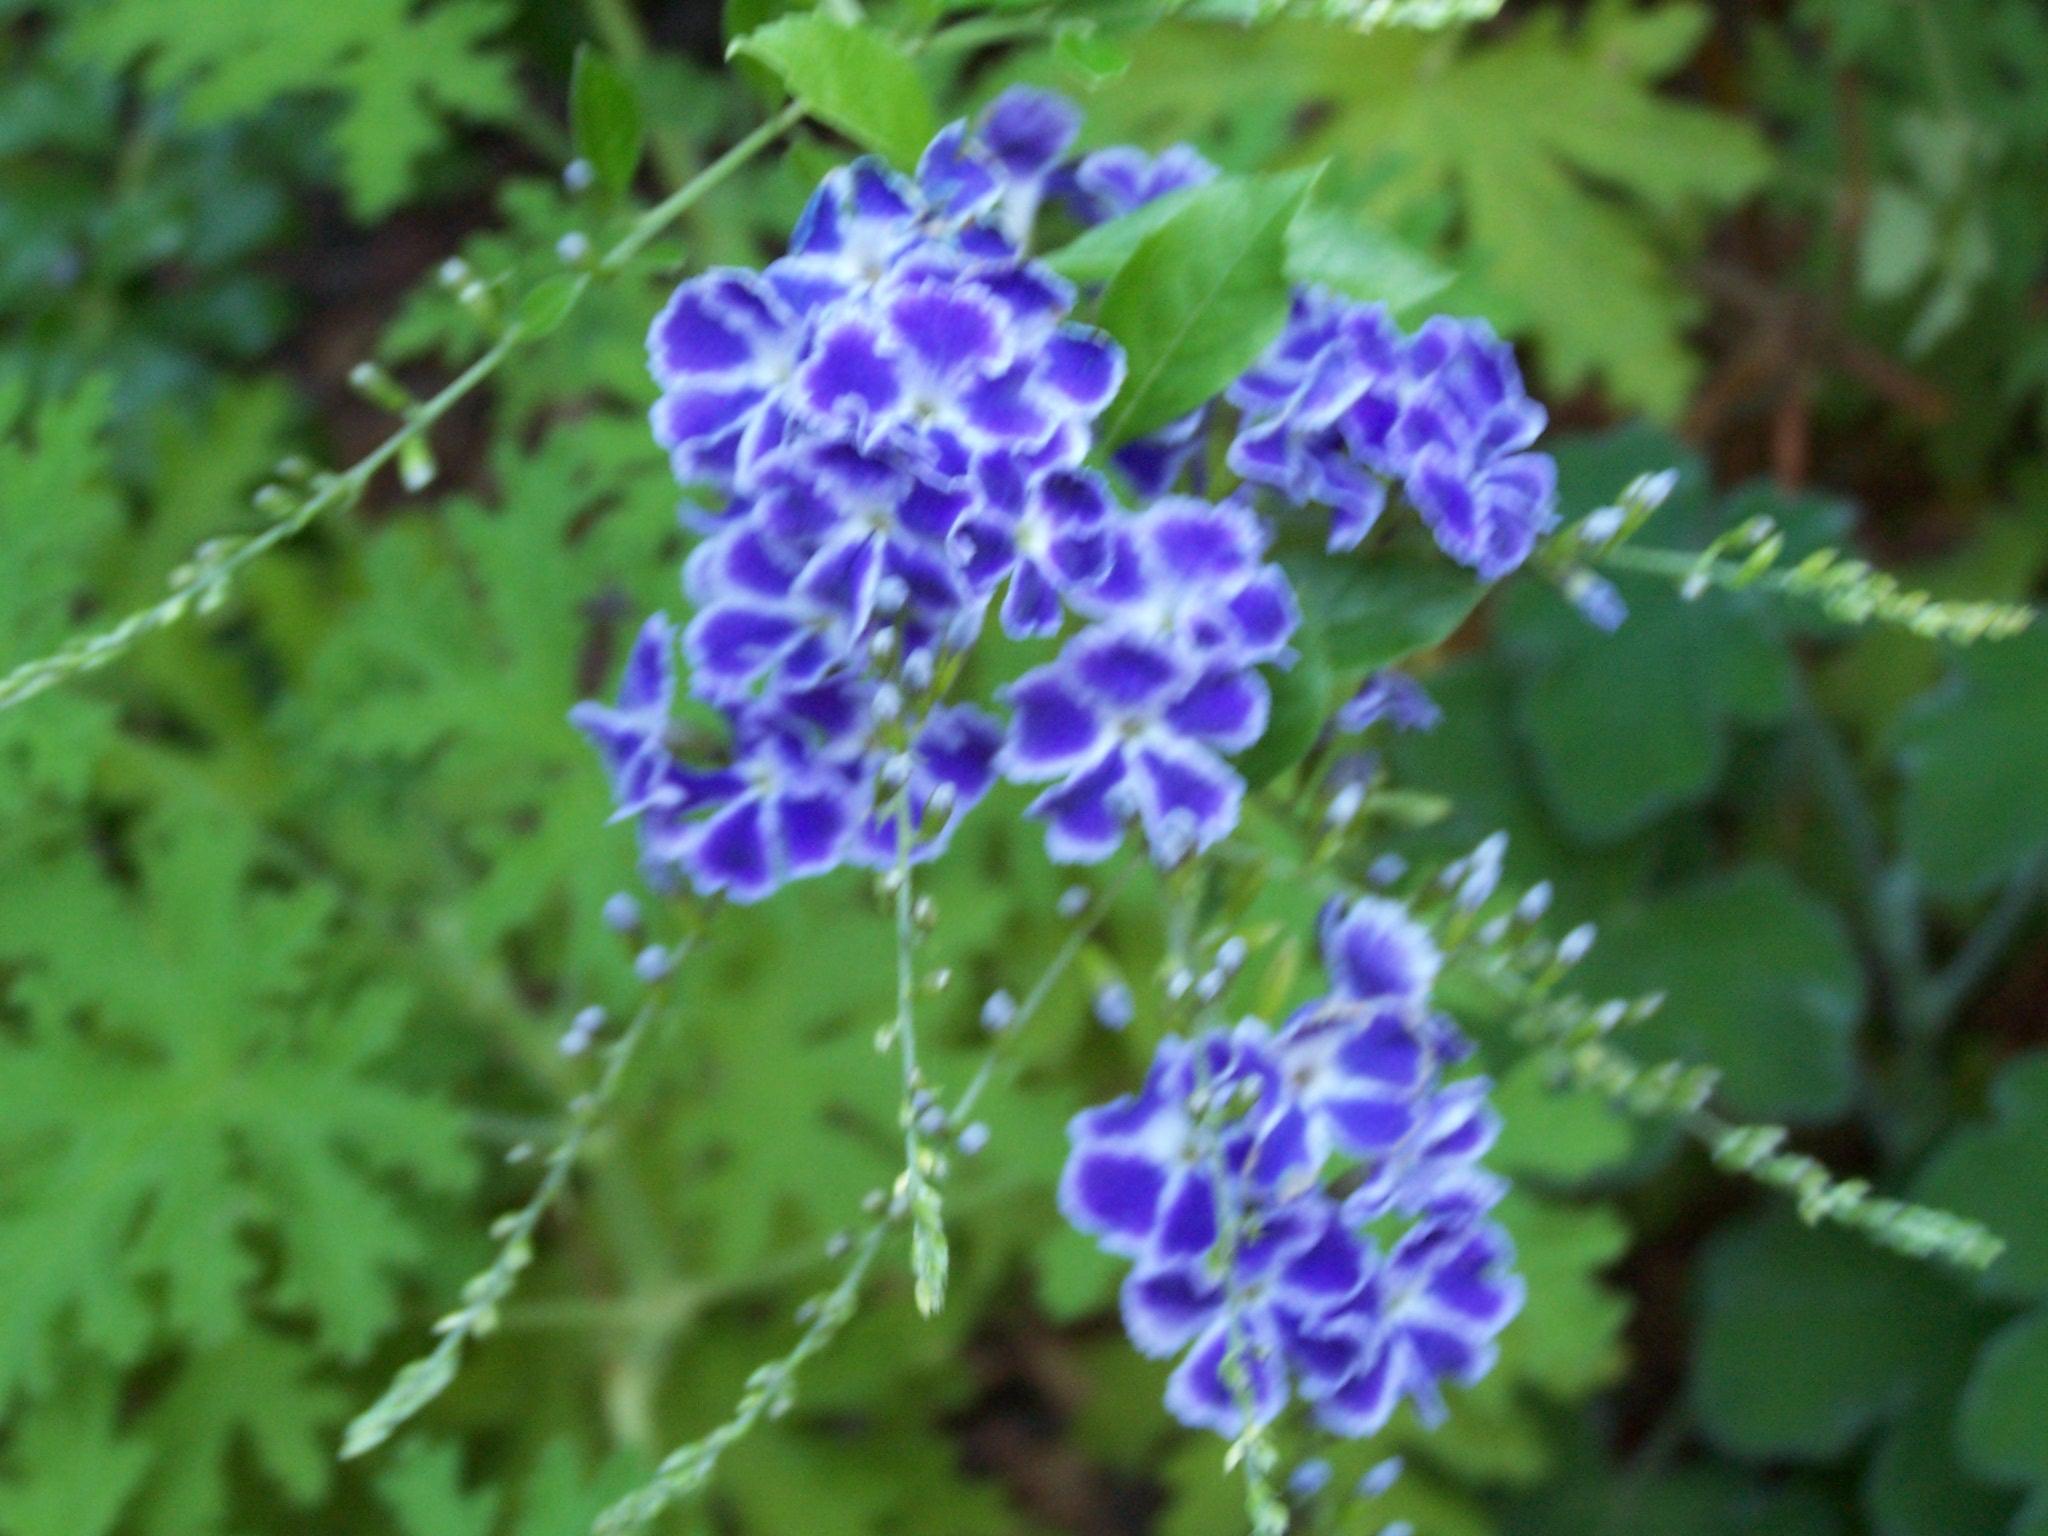 Filesmall Purple Flowersg Wikimedia Commons